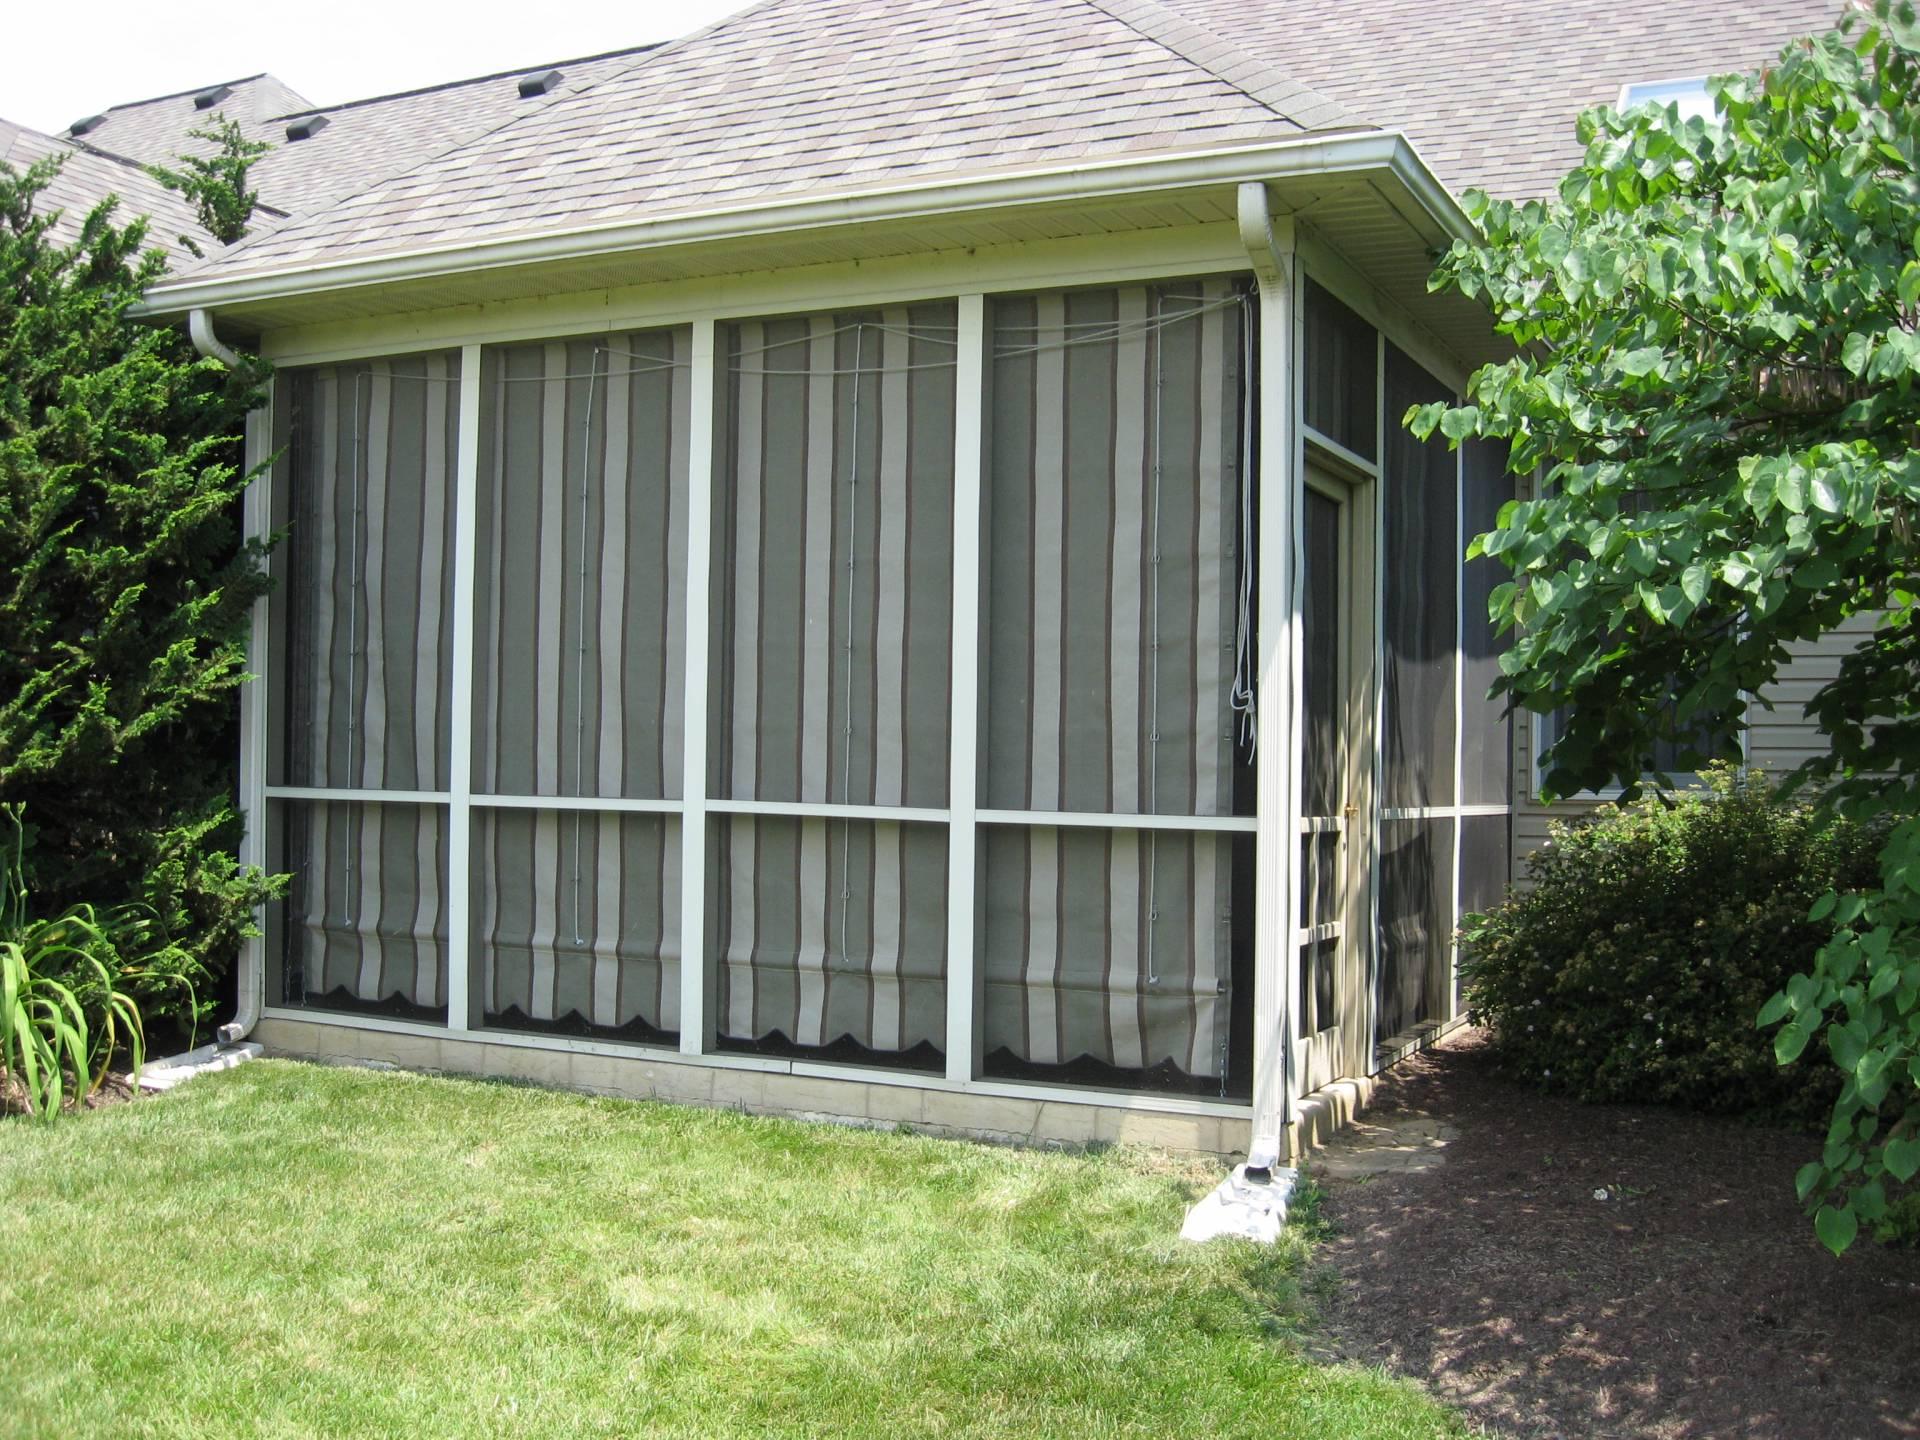 Sunbrella Drop Curtains For A Screen Porch Kreider 39 S